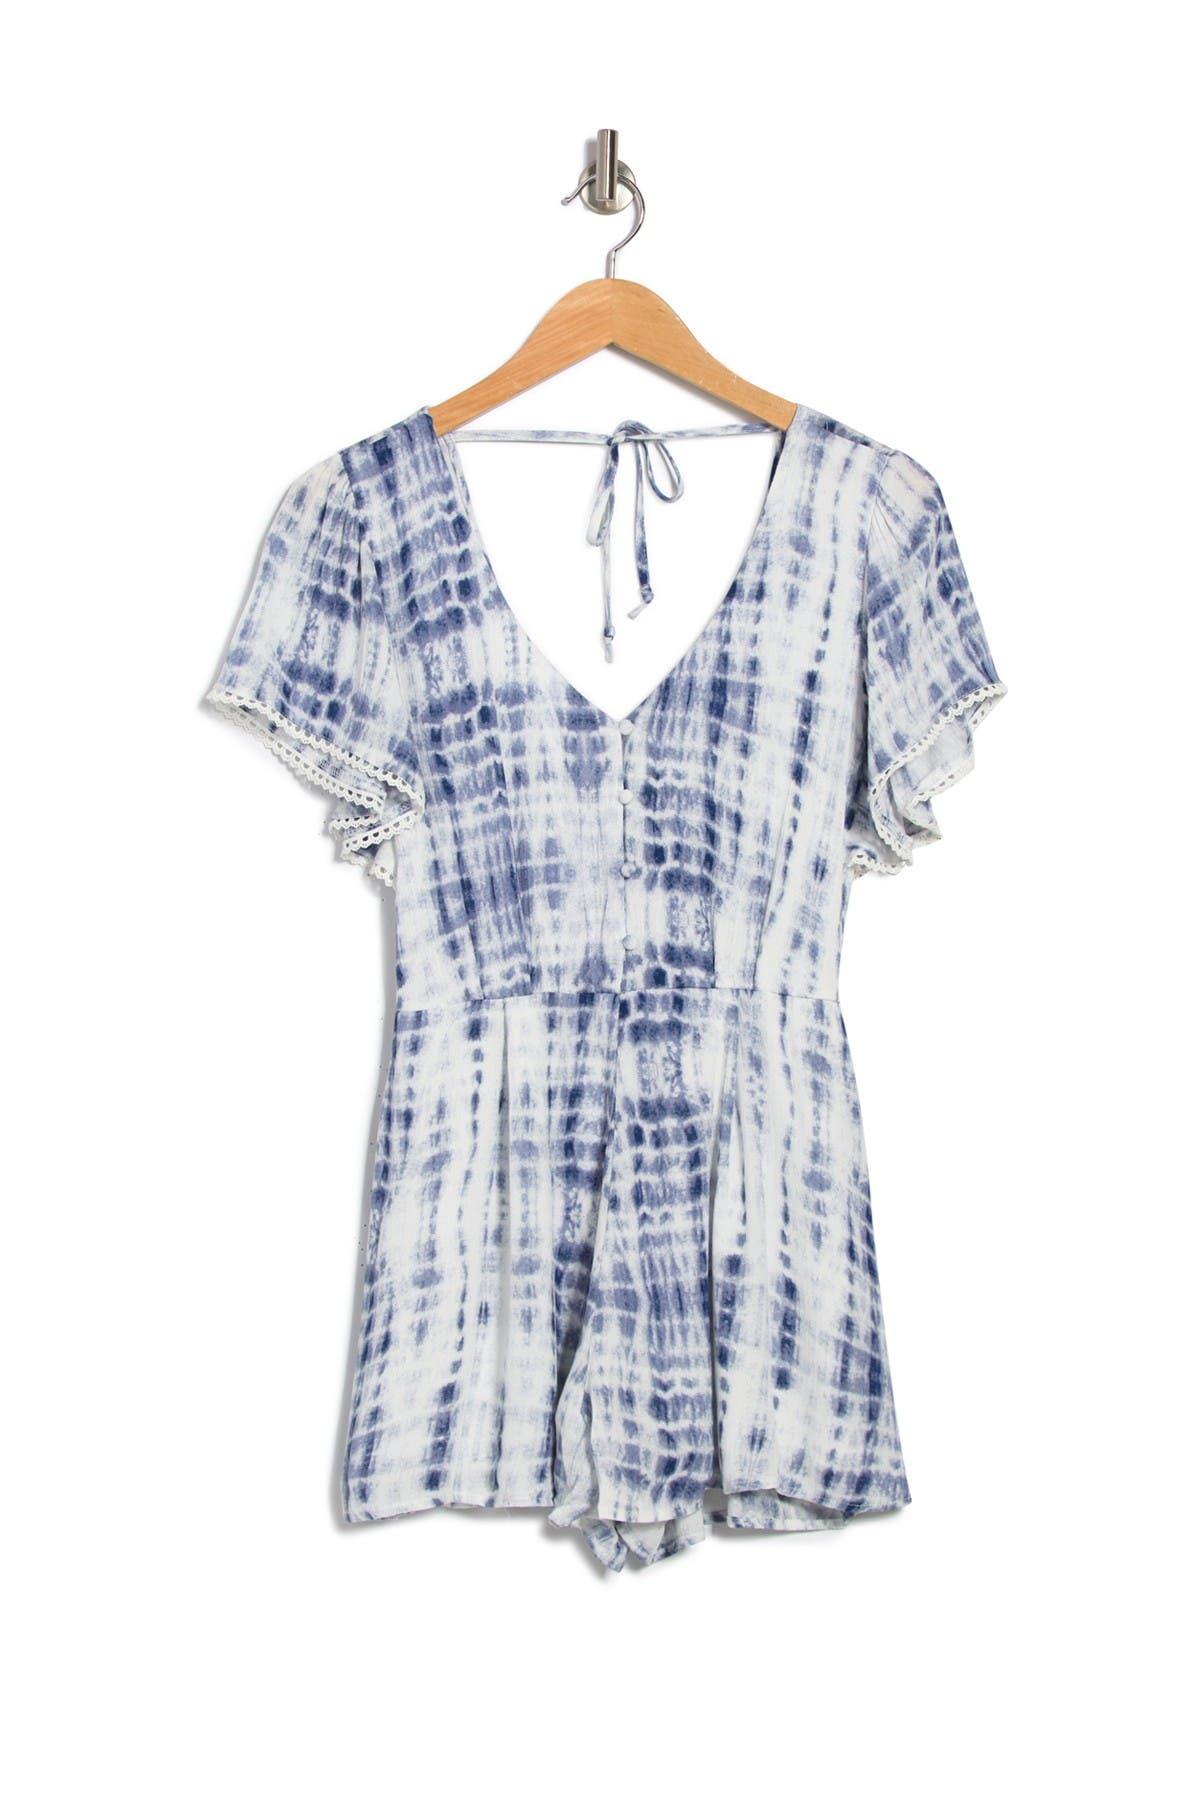 Image of ROW A Tiered Ruffle Dress